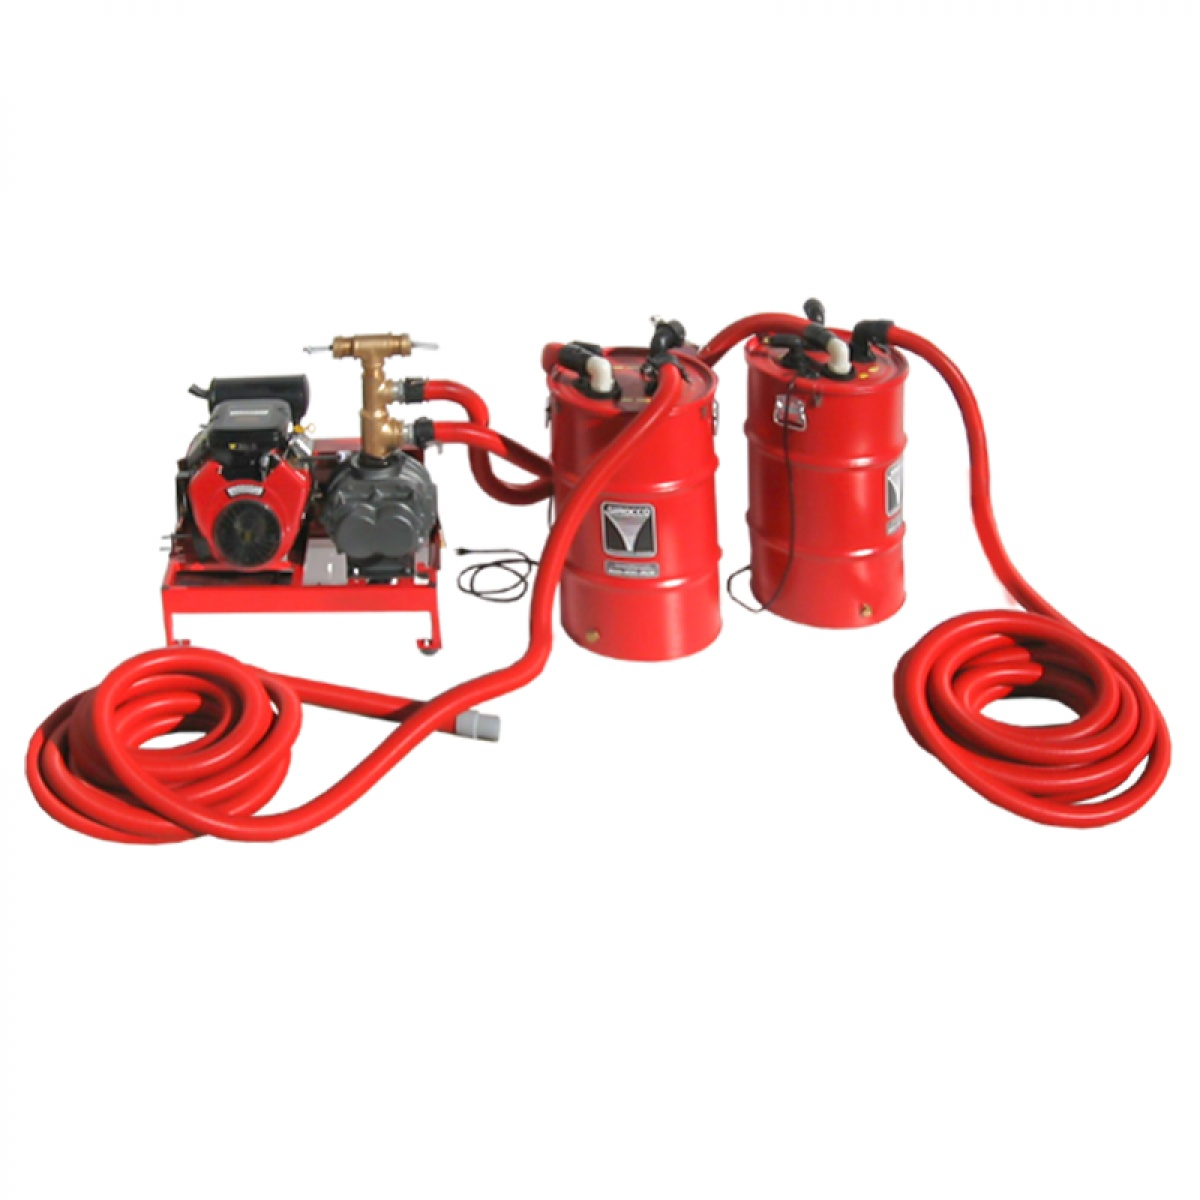 SGV4-29 Stationary Vacuum System